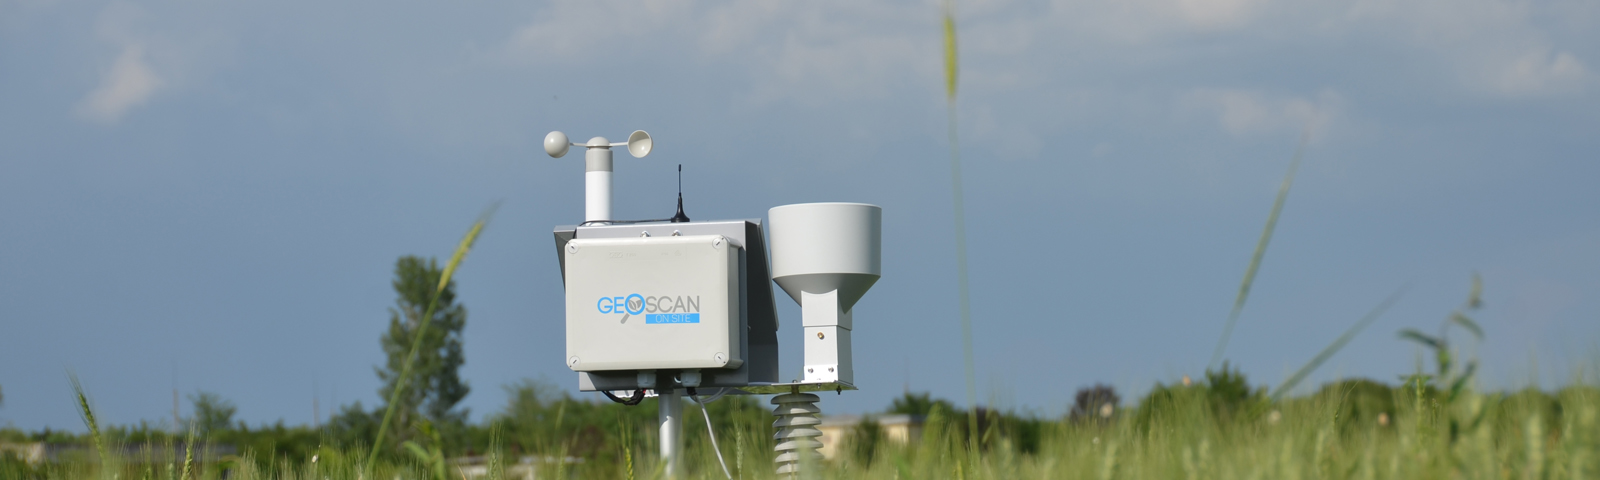 geoscan-onsite-meteo-station-on-the-field